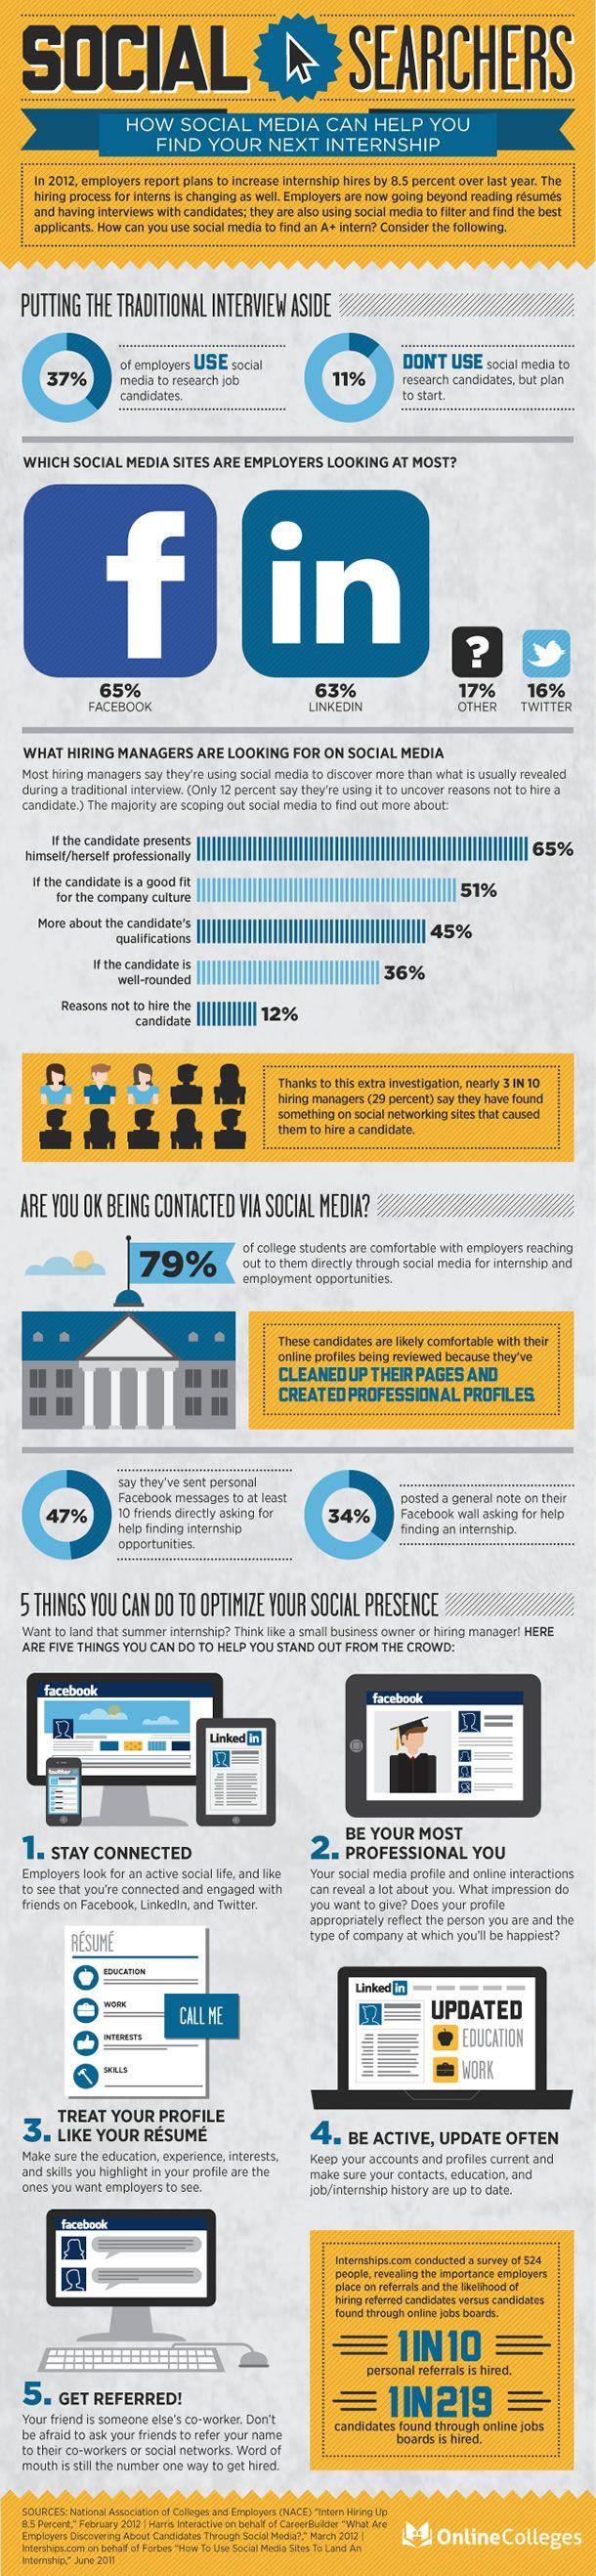 Social searchers [infographie] #SocialMedia